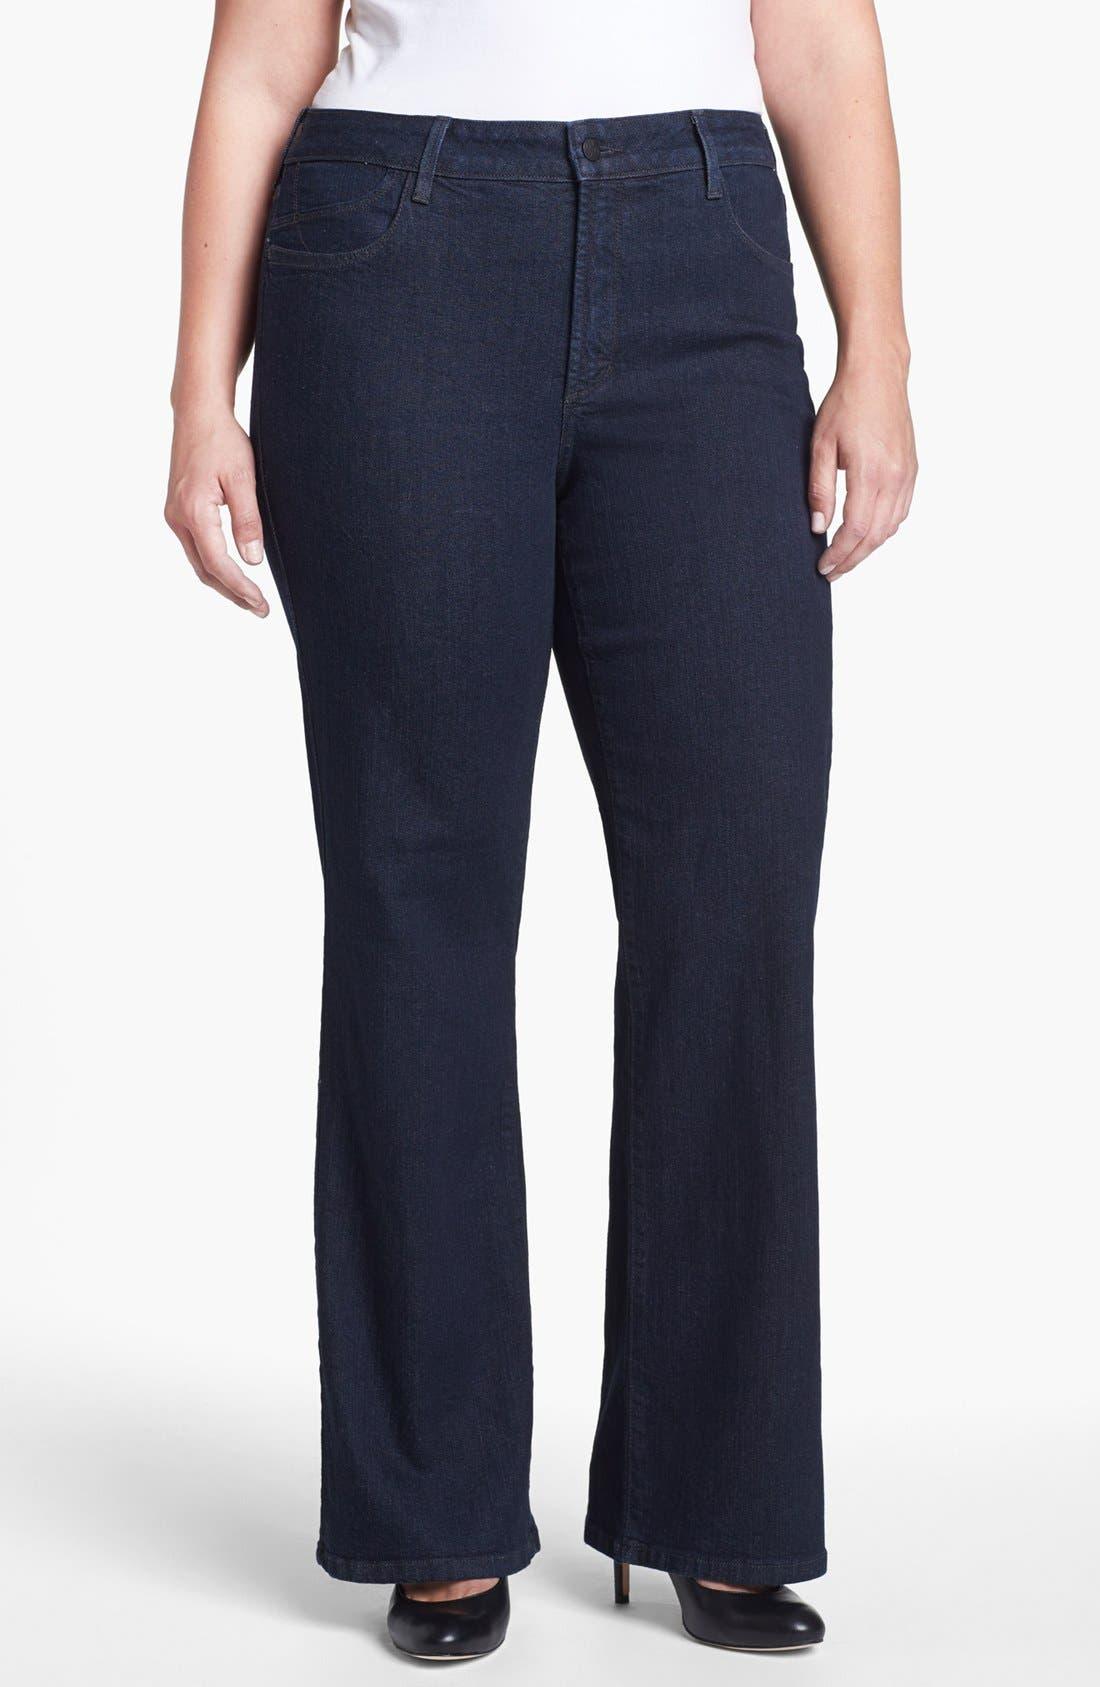 Main Image - NYDJ 'Sarah' Stretch Bootcut Jeans (Dark Enzyme) (Plus Size)